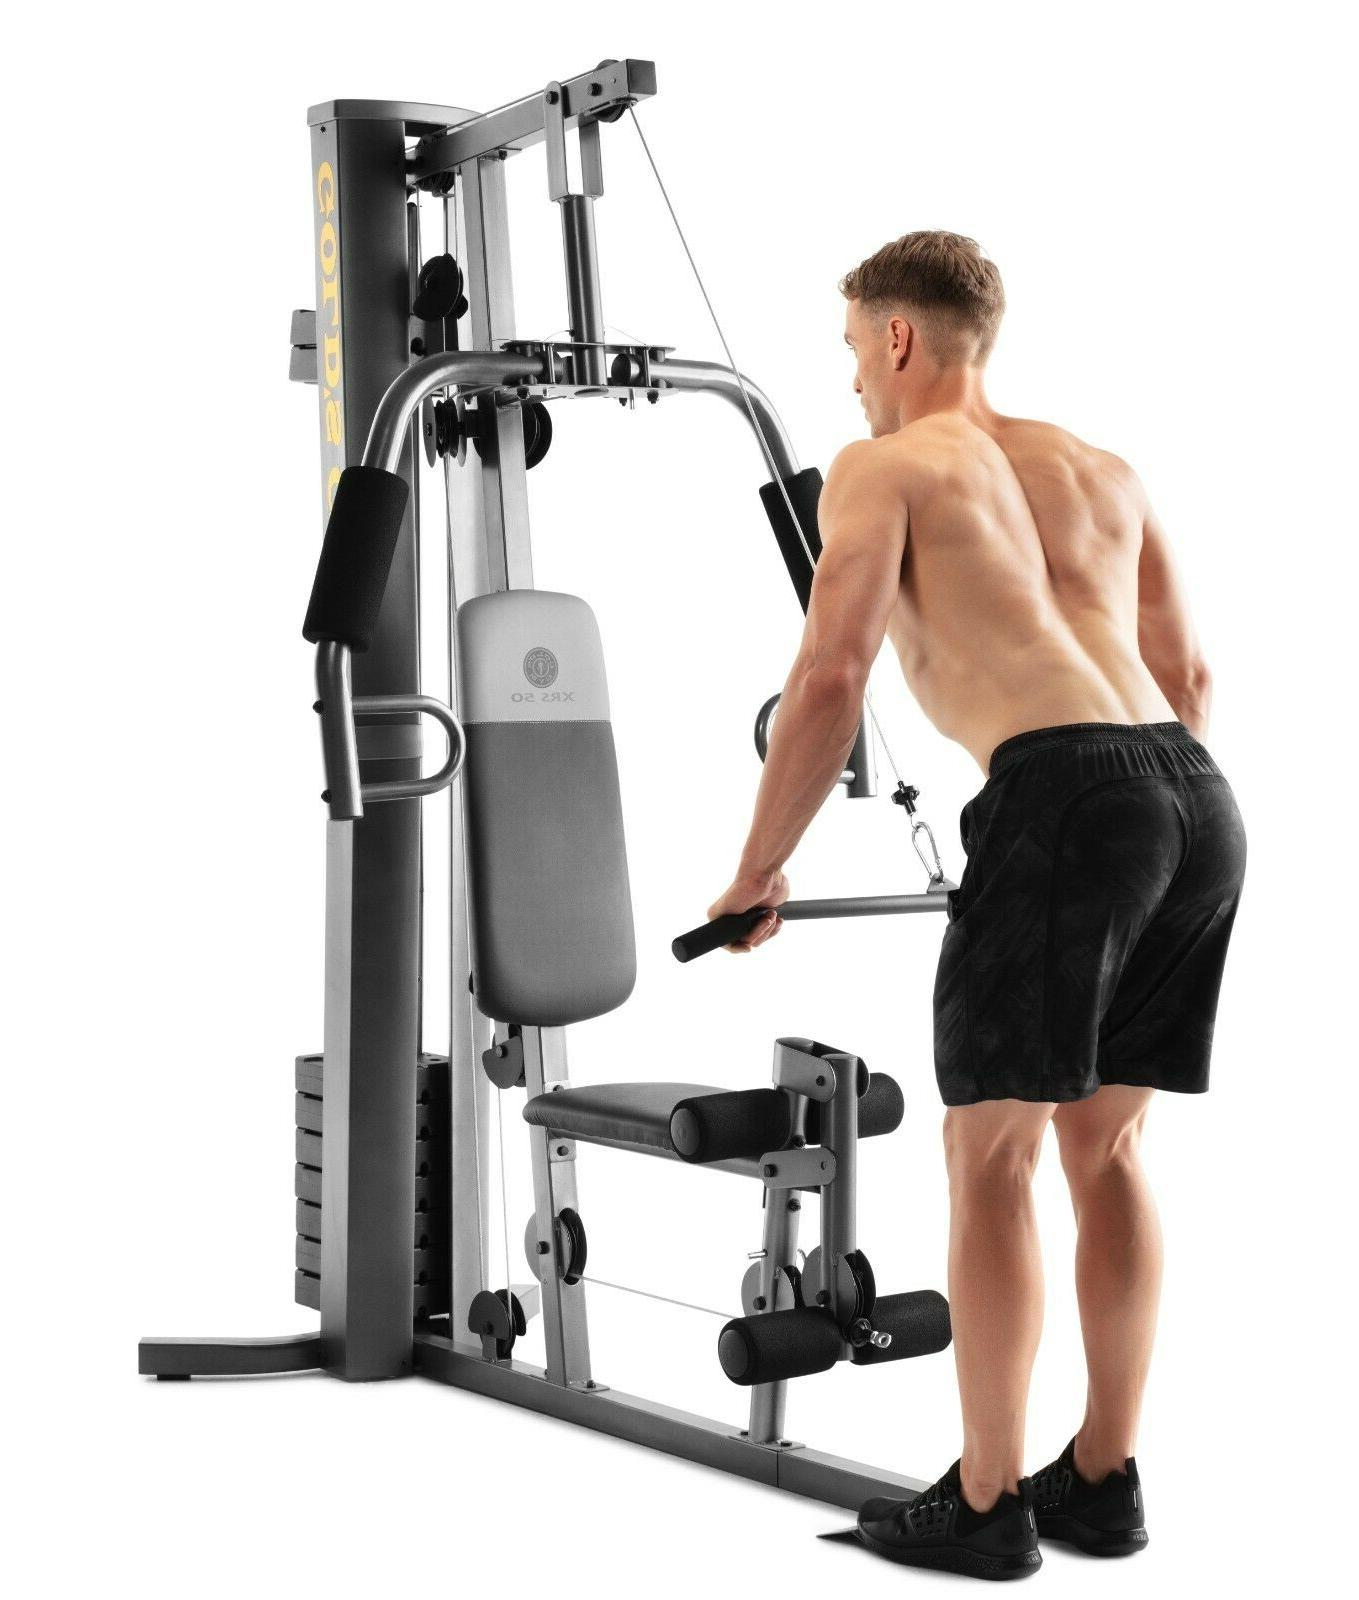 Home Machine Fitness Exercise Equipment